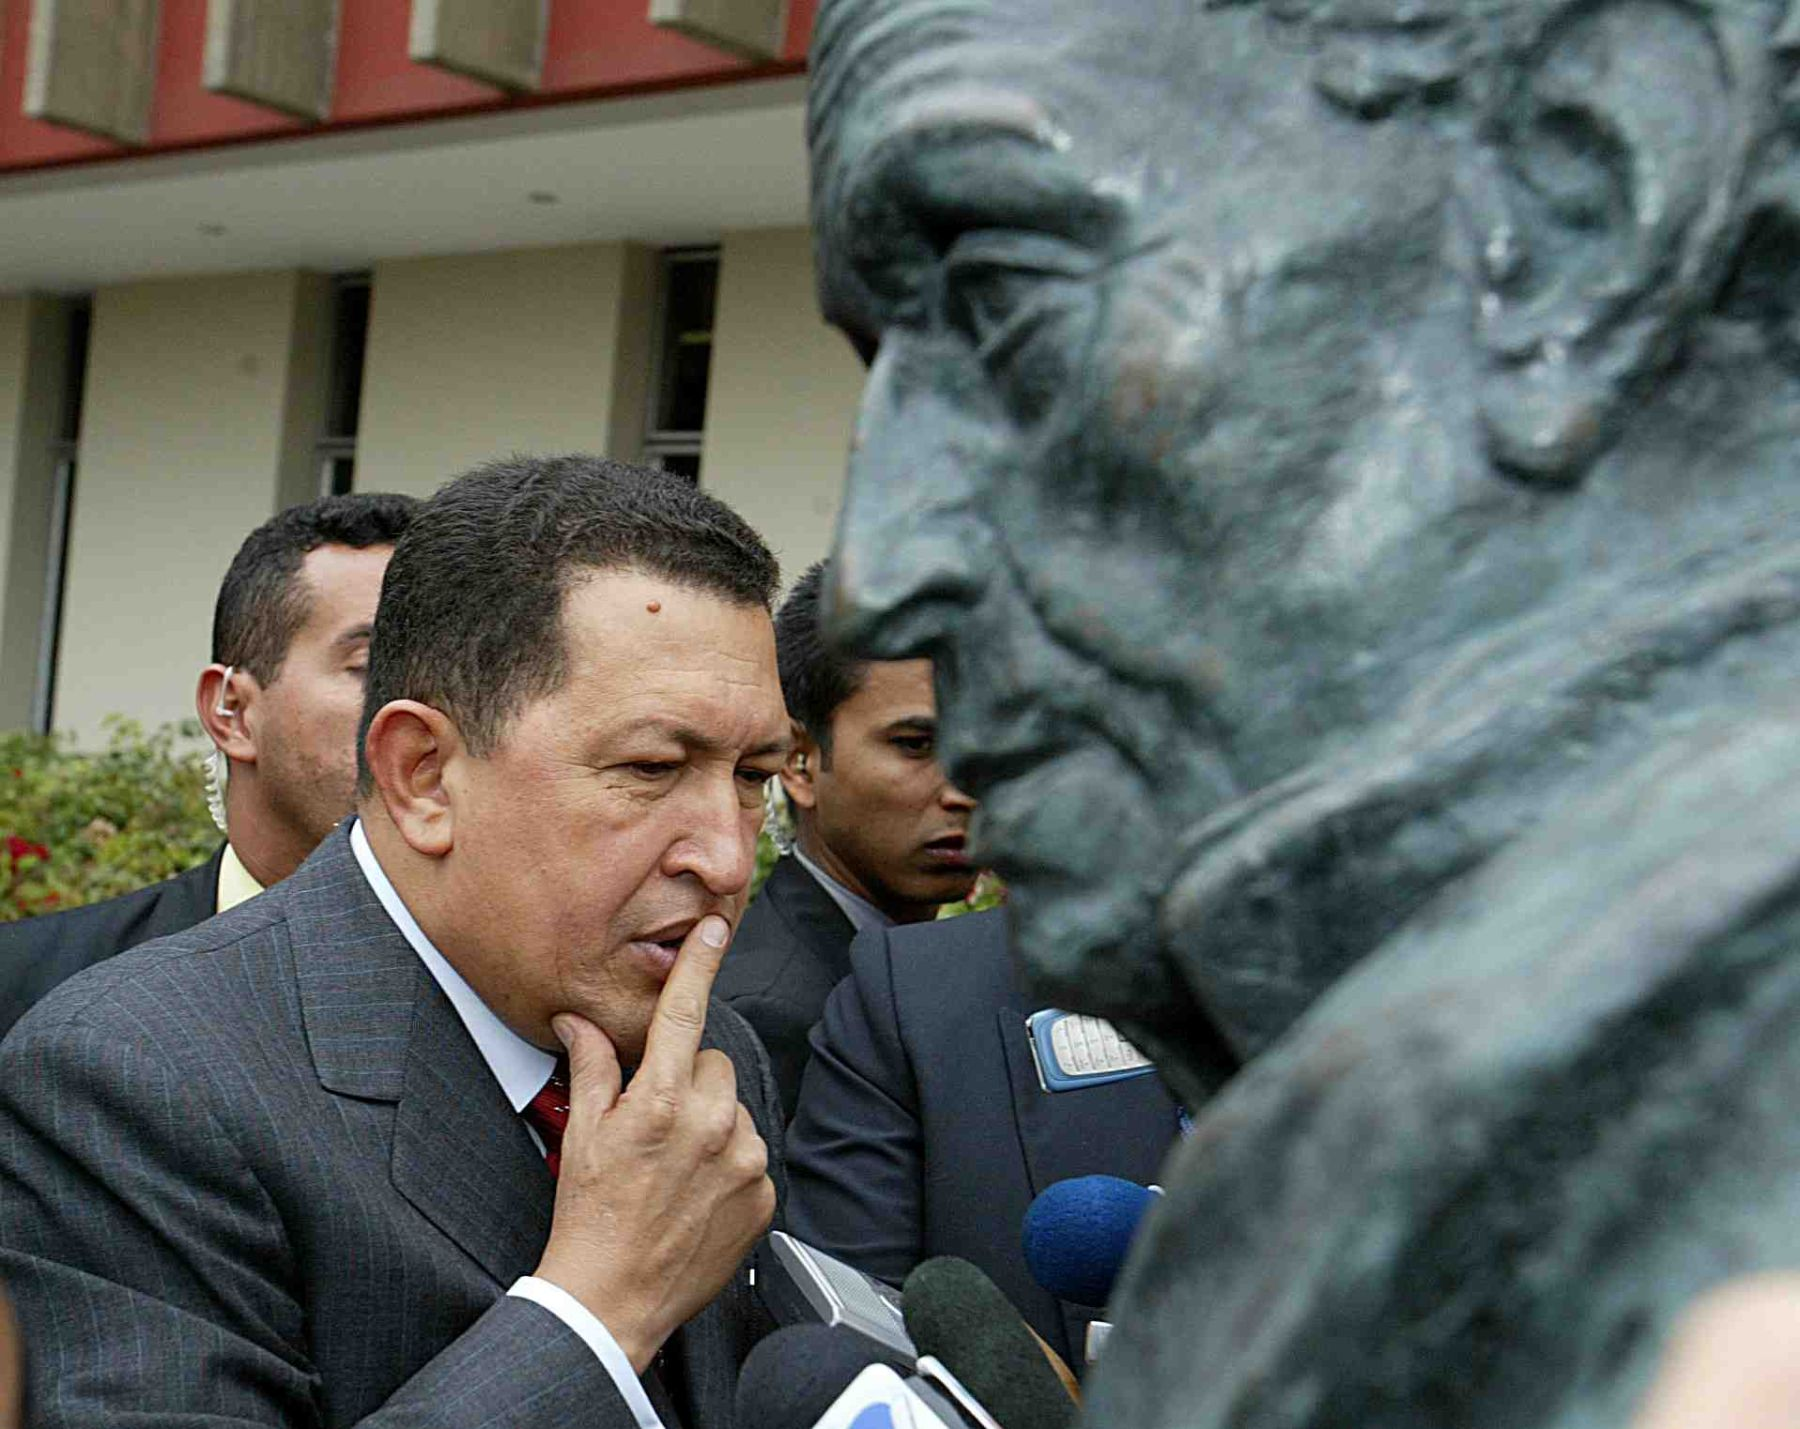 España extraditará a ex-enfermera de Chávez